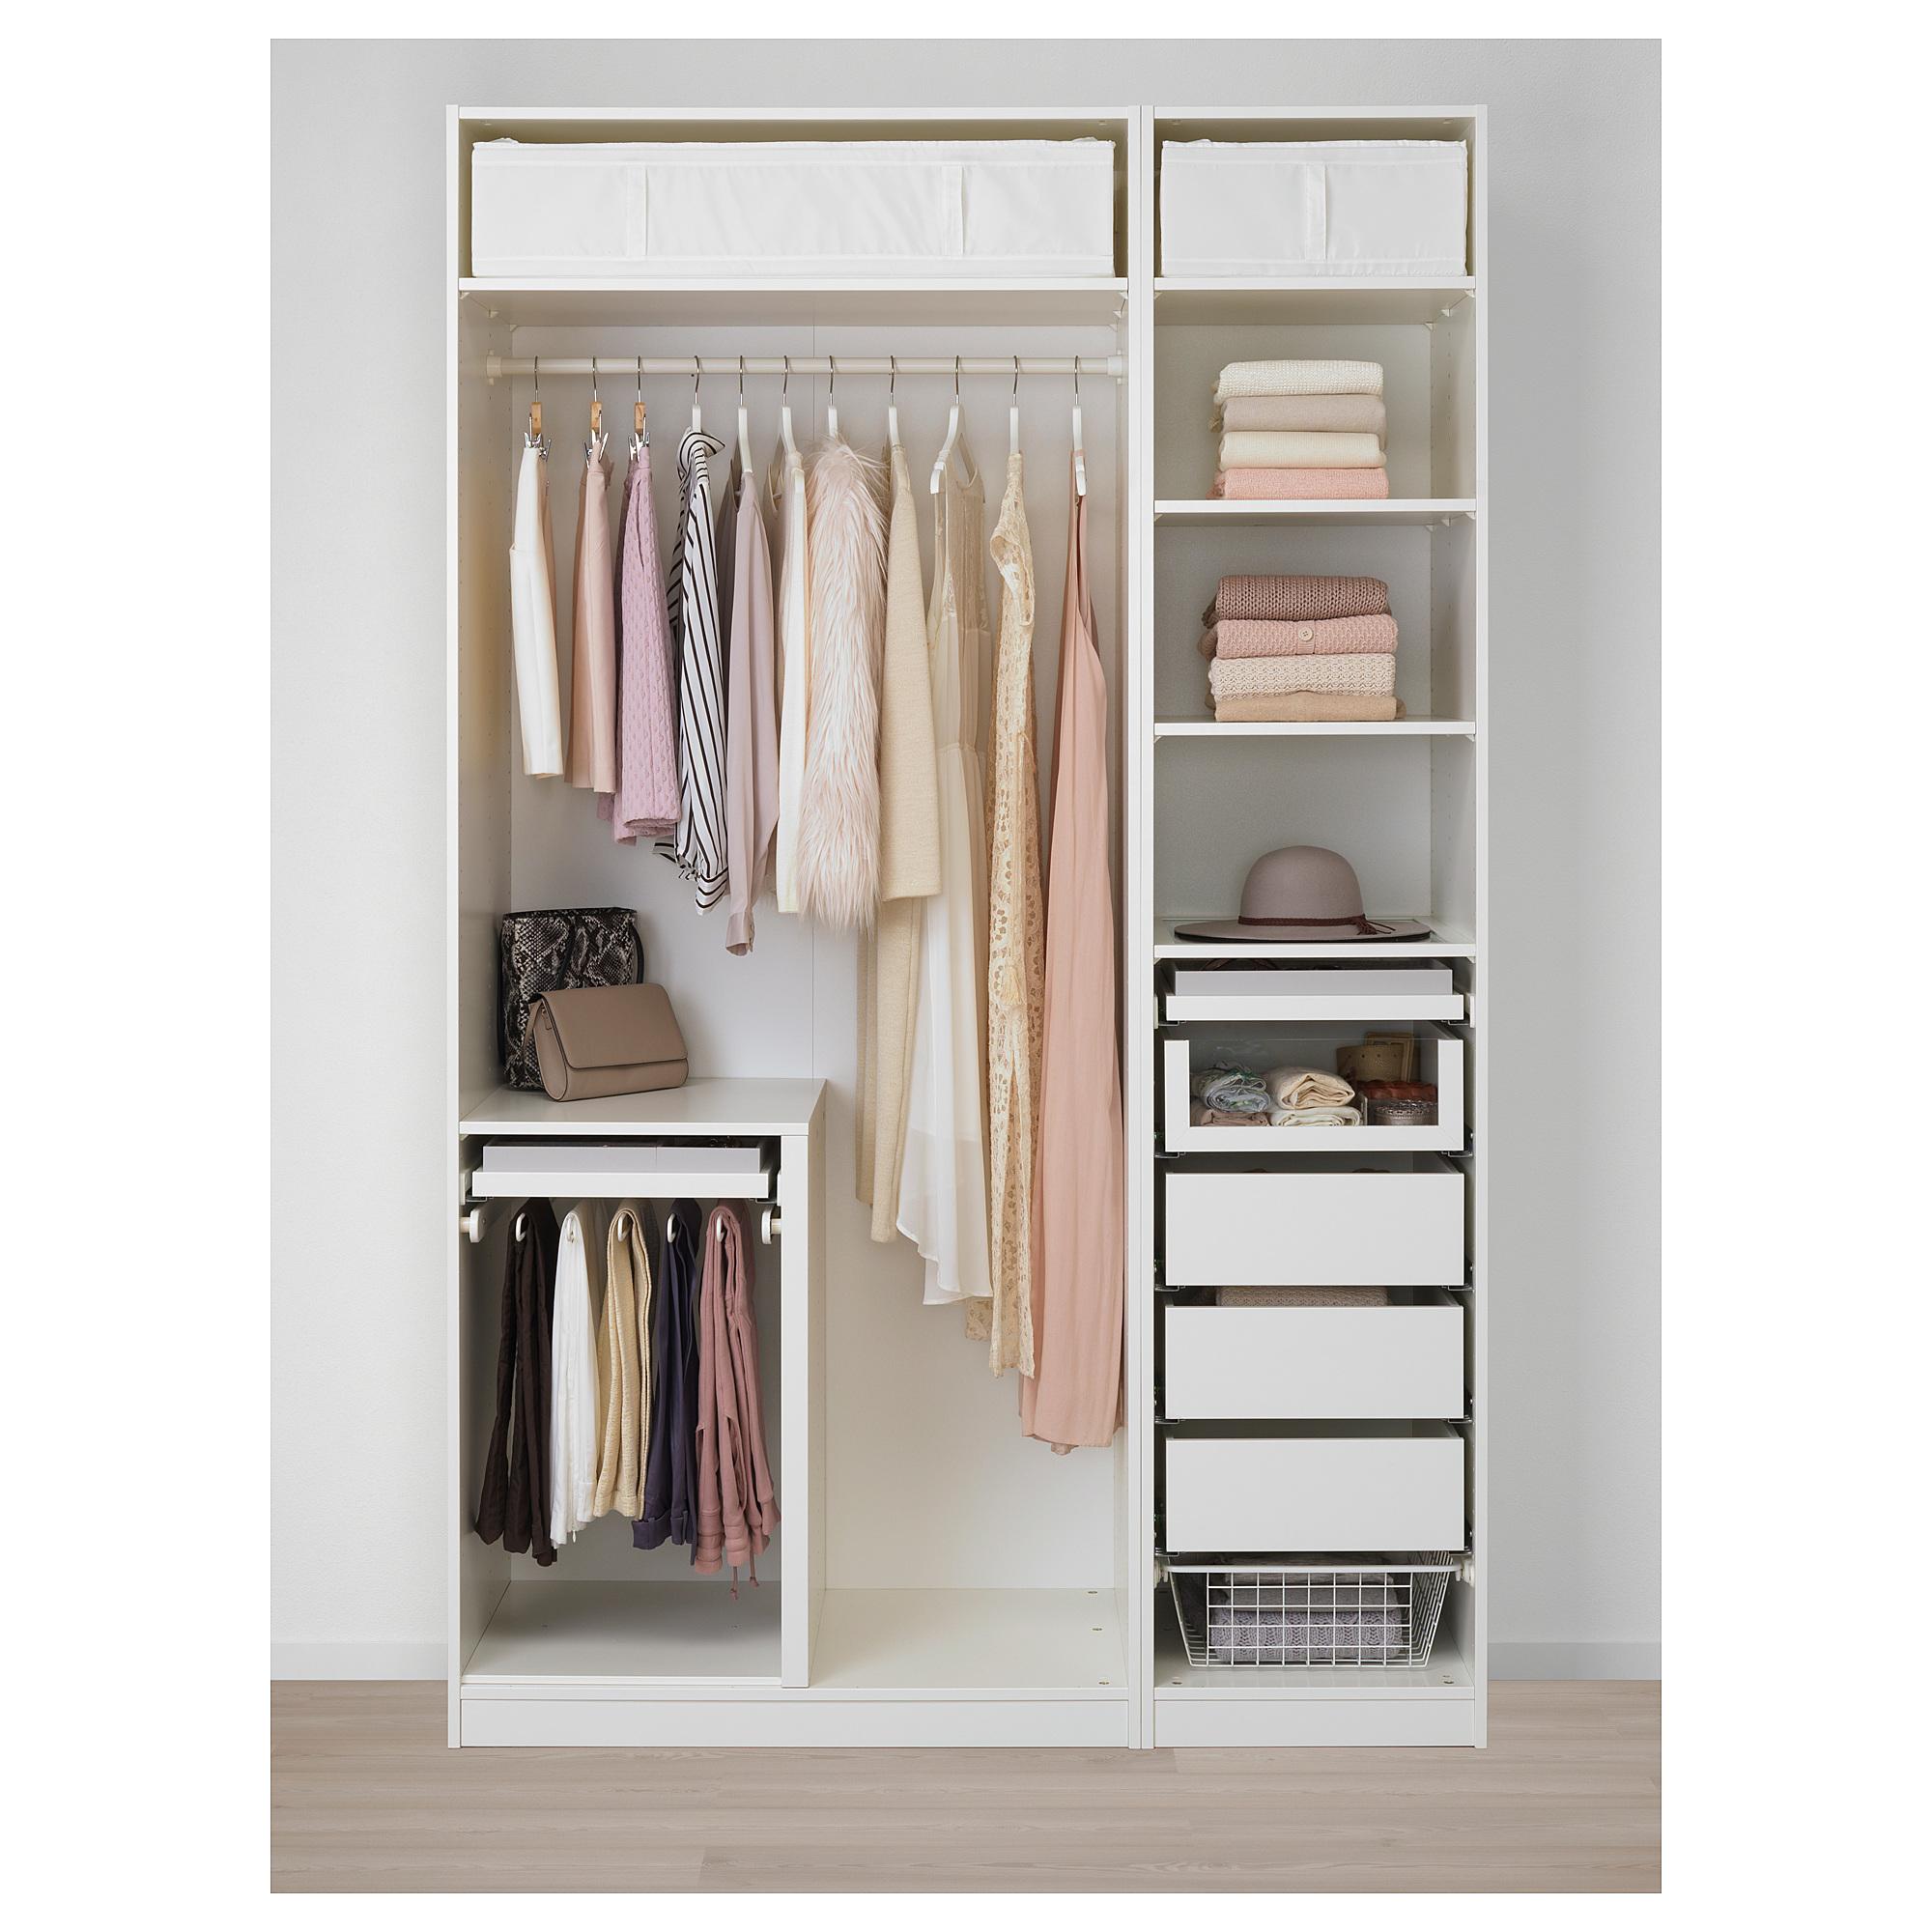 Гардероб ПАКС белый артикуль № 192.649.63 в наличии. Онлайн сайт IKEA РБ. Недорогая доставка и соборка.